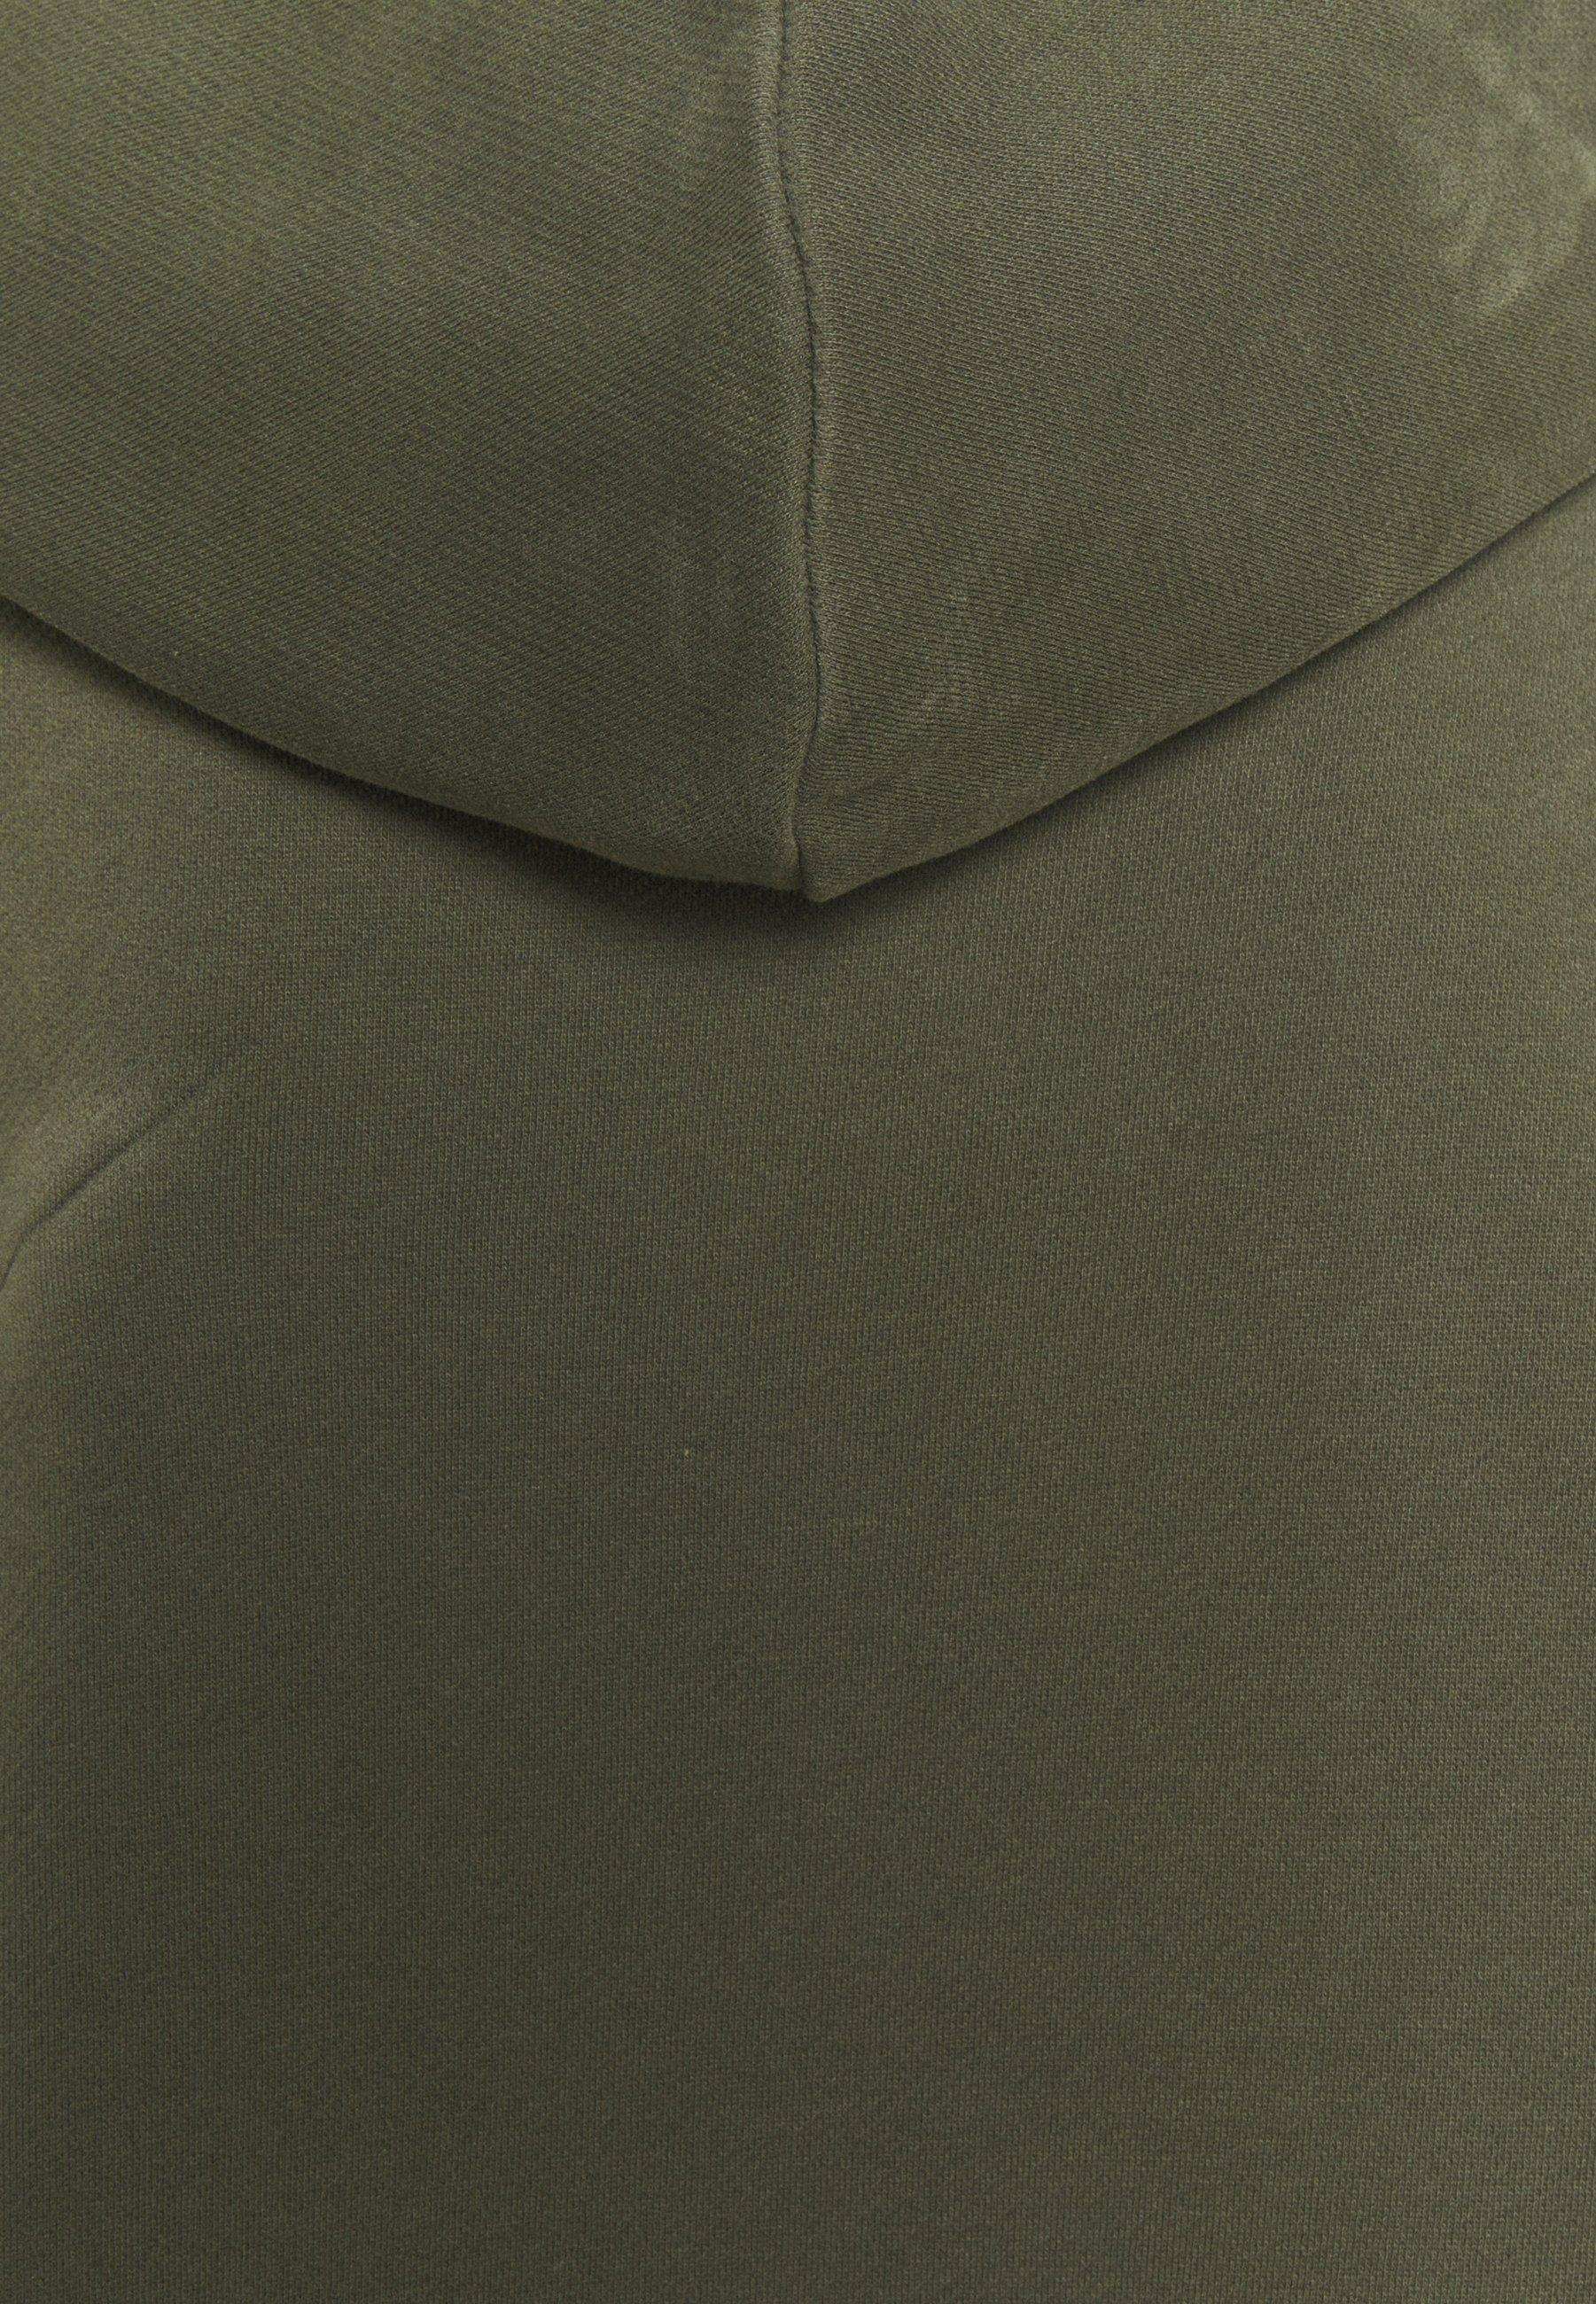 Marc O'polo Denim Hoodie - Utility Olive/oliven